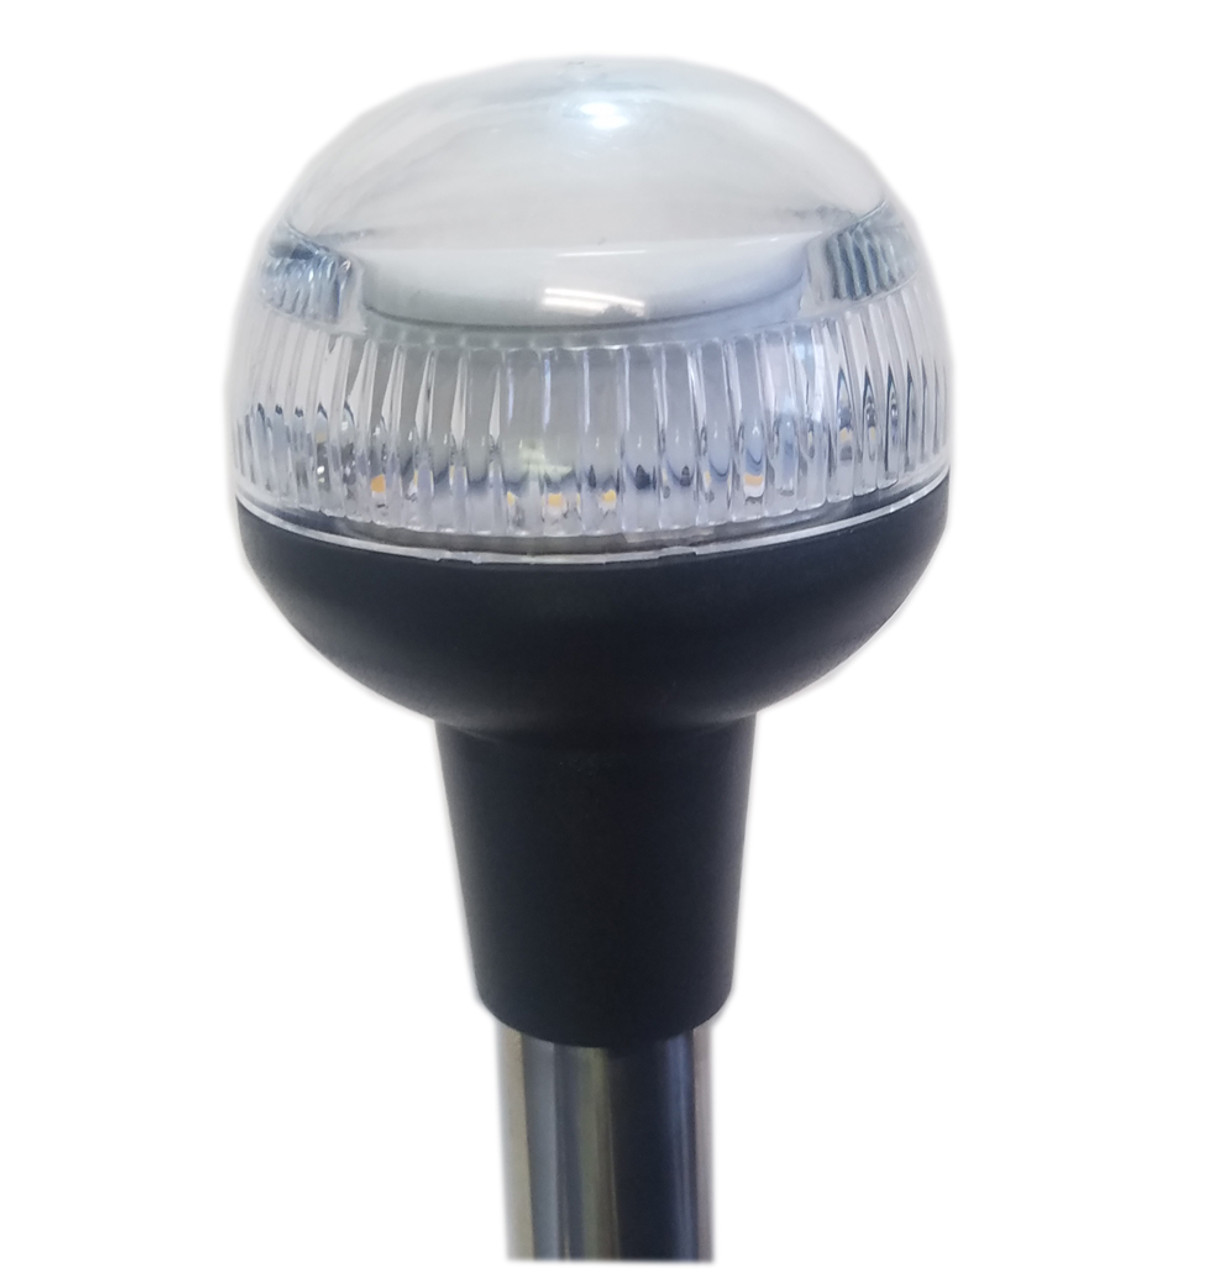 8 high output white LEDs